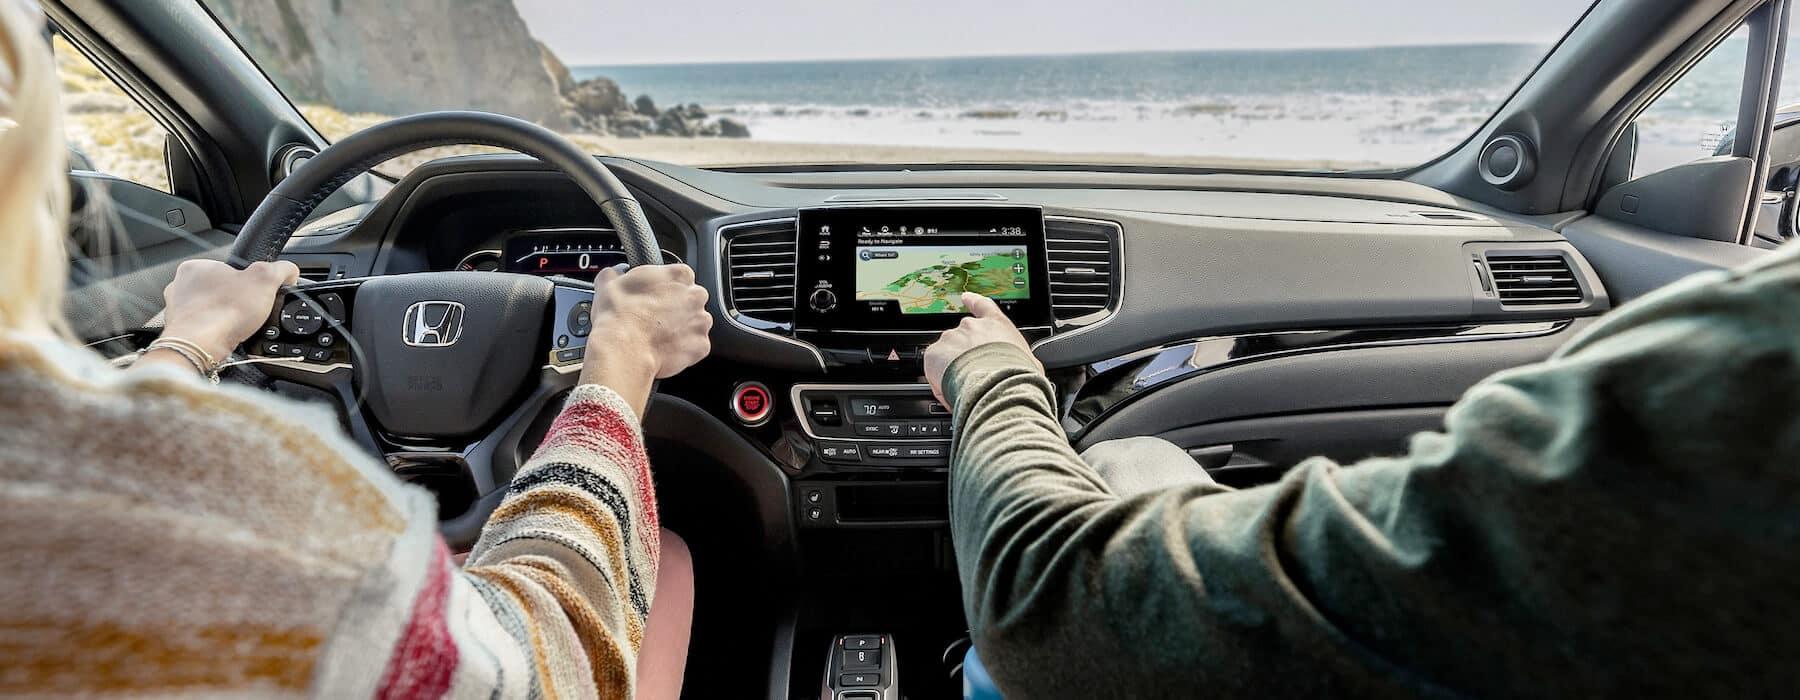 Honda Resale Value Vern Eide Honda Sioux City Slider